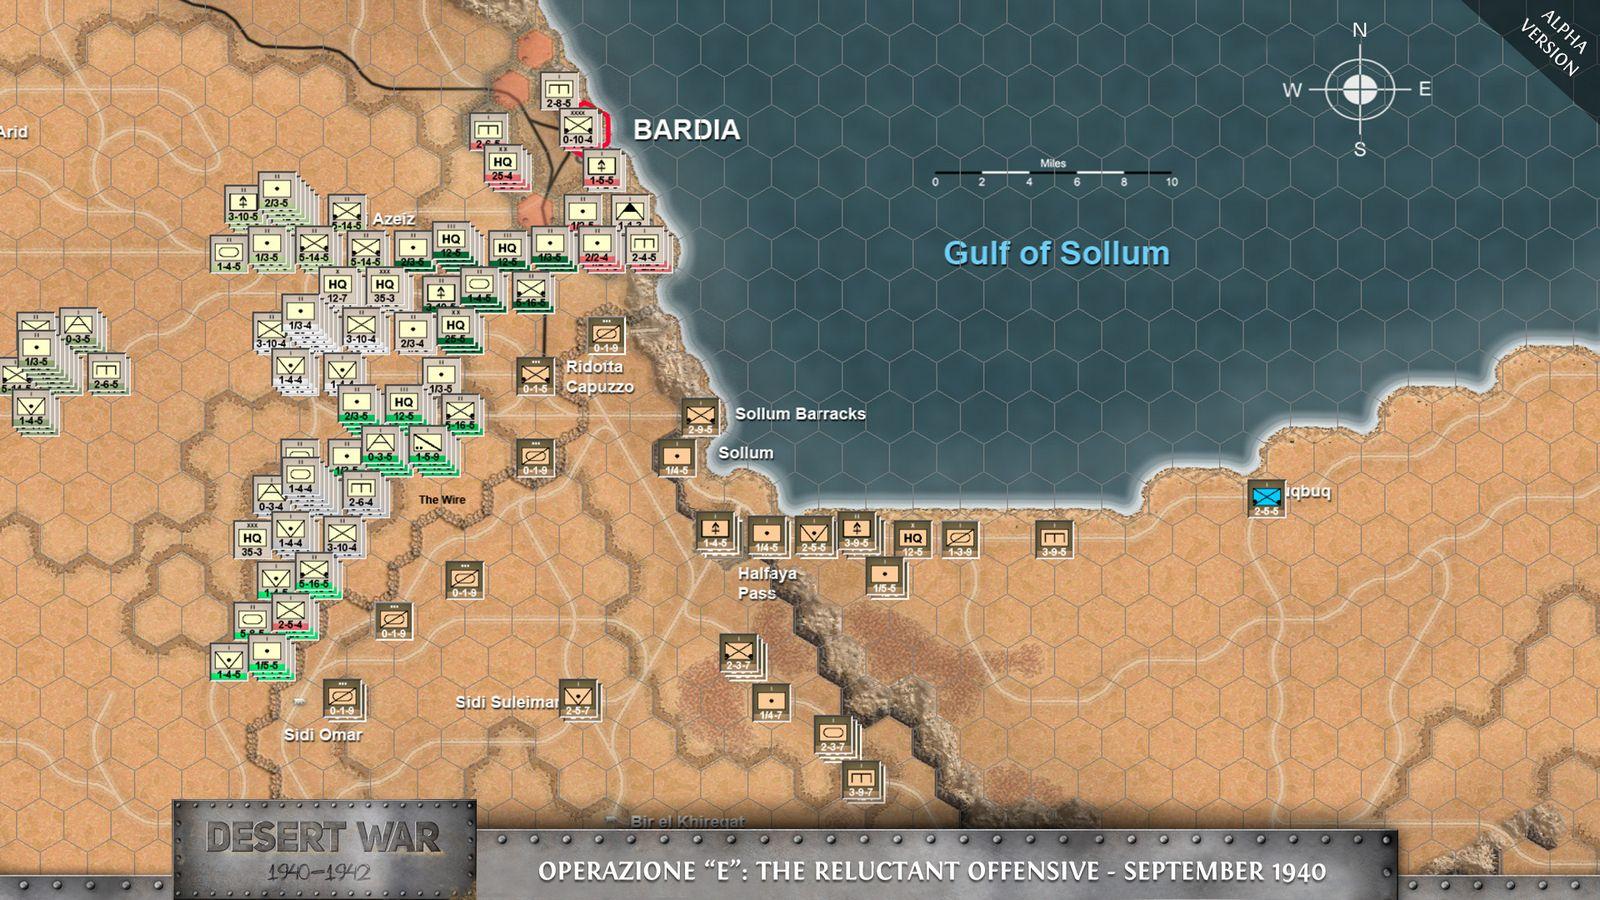 desert-war-40-42-0717-1-Operazione_E_The-Reluctant_Offensive_Sep_1940